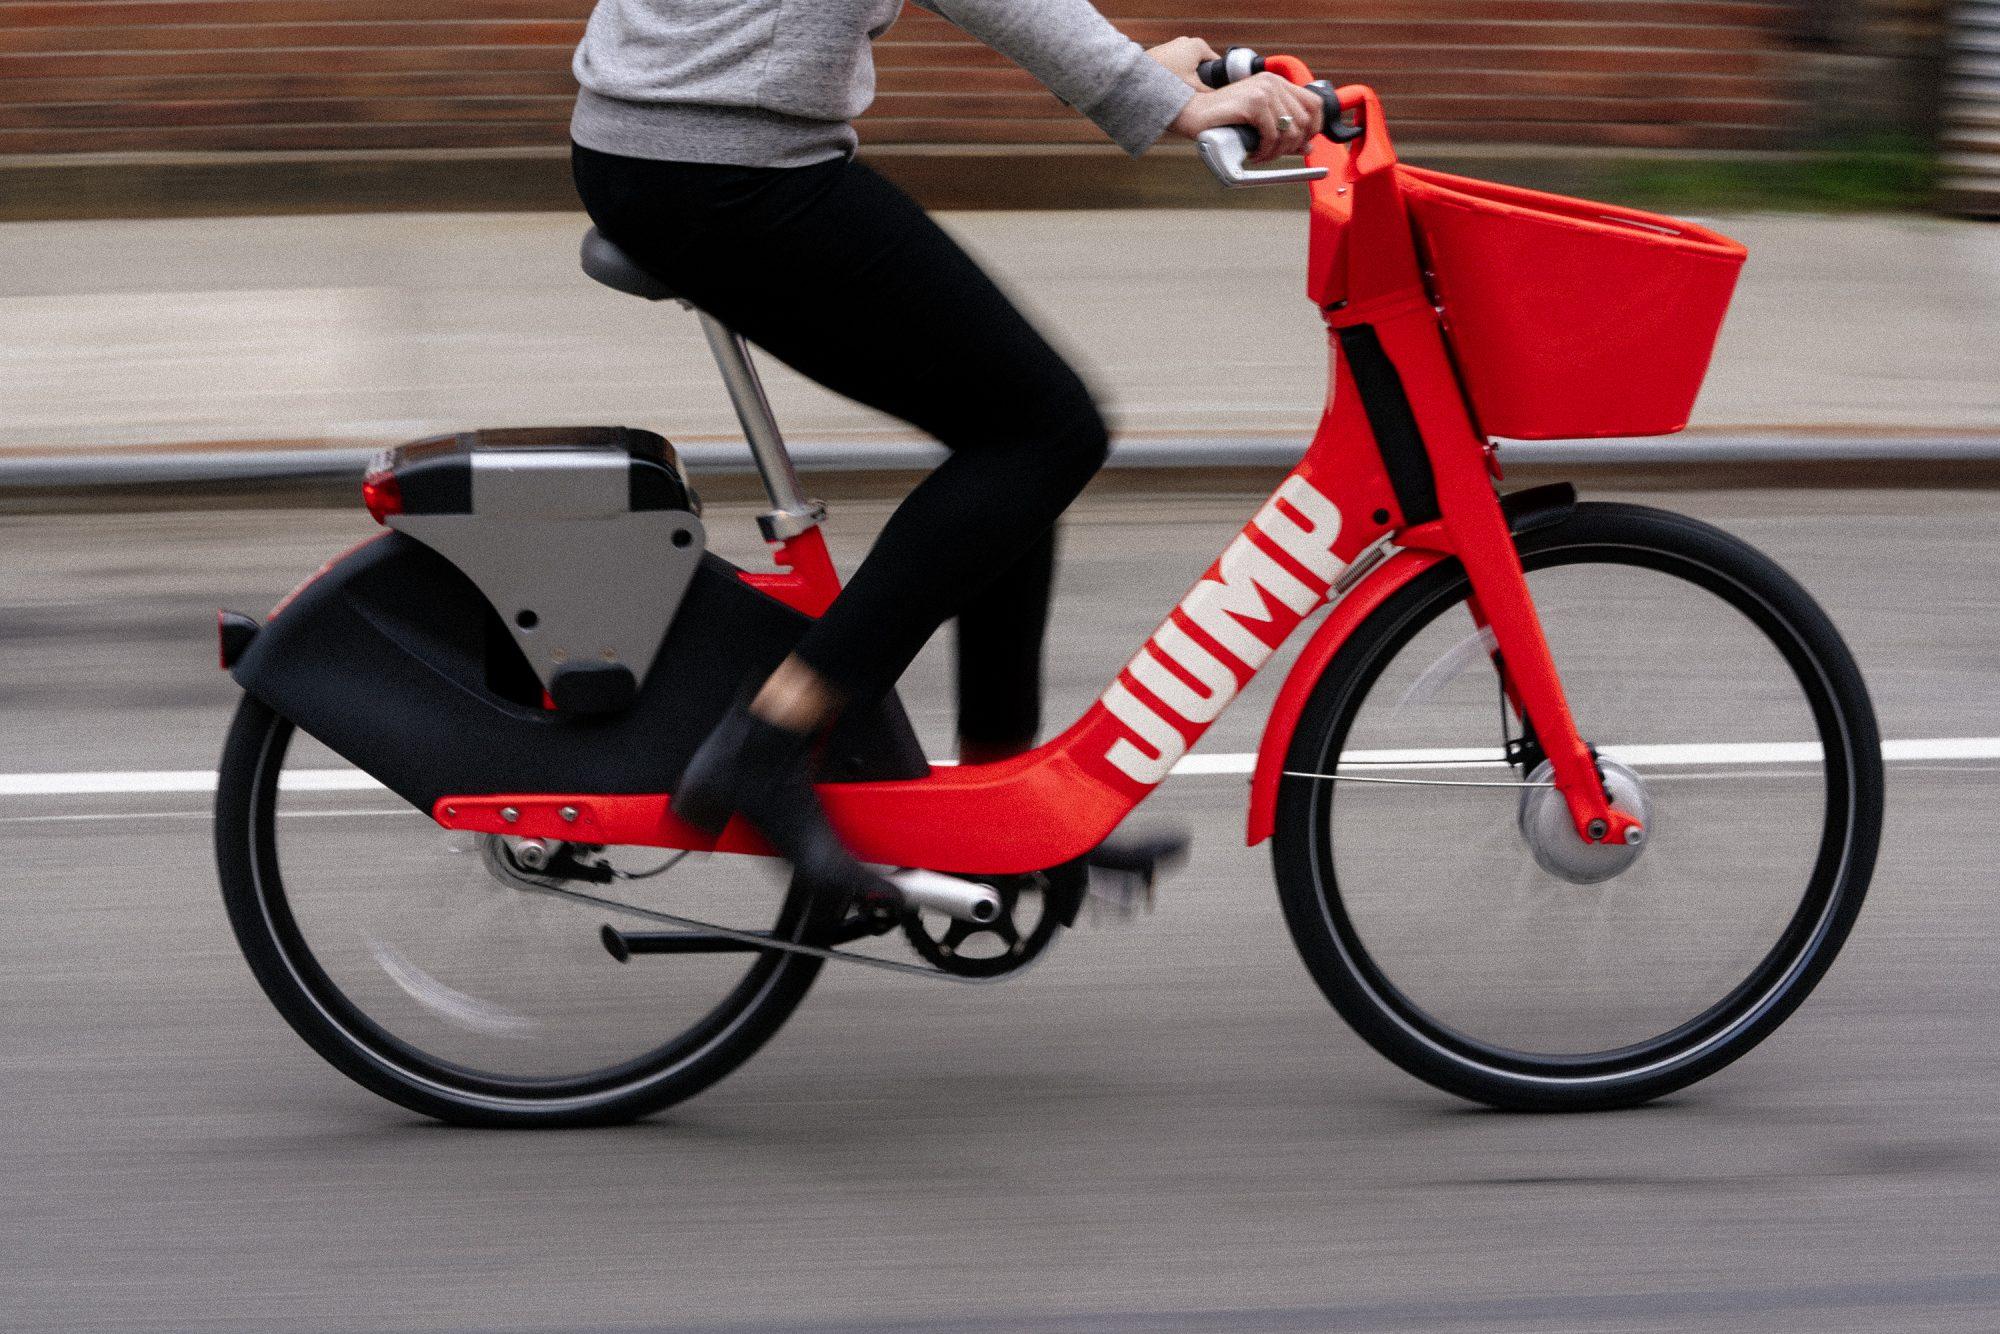 uber is bringing dockless electric bikes to the bronx rockaways